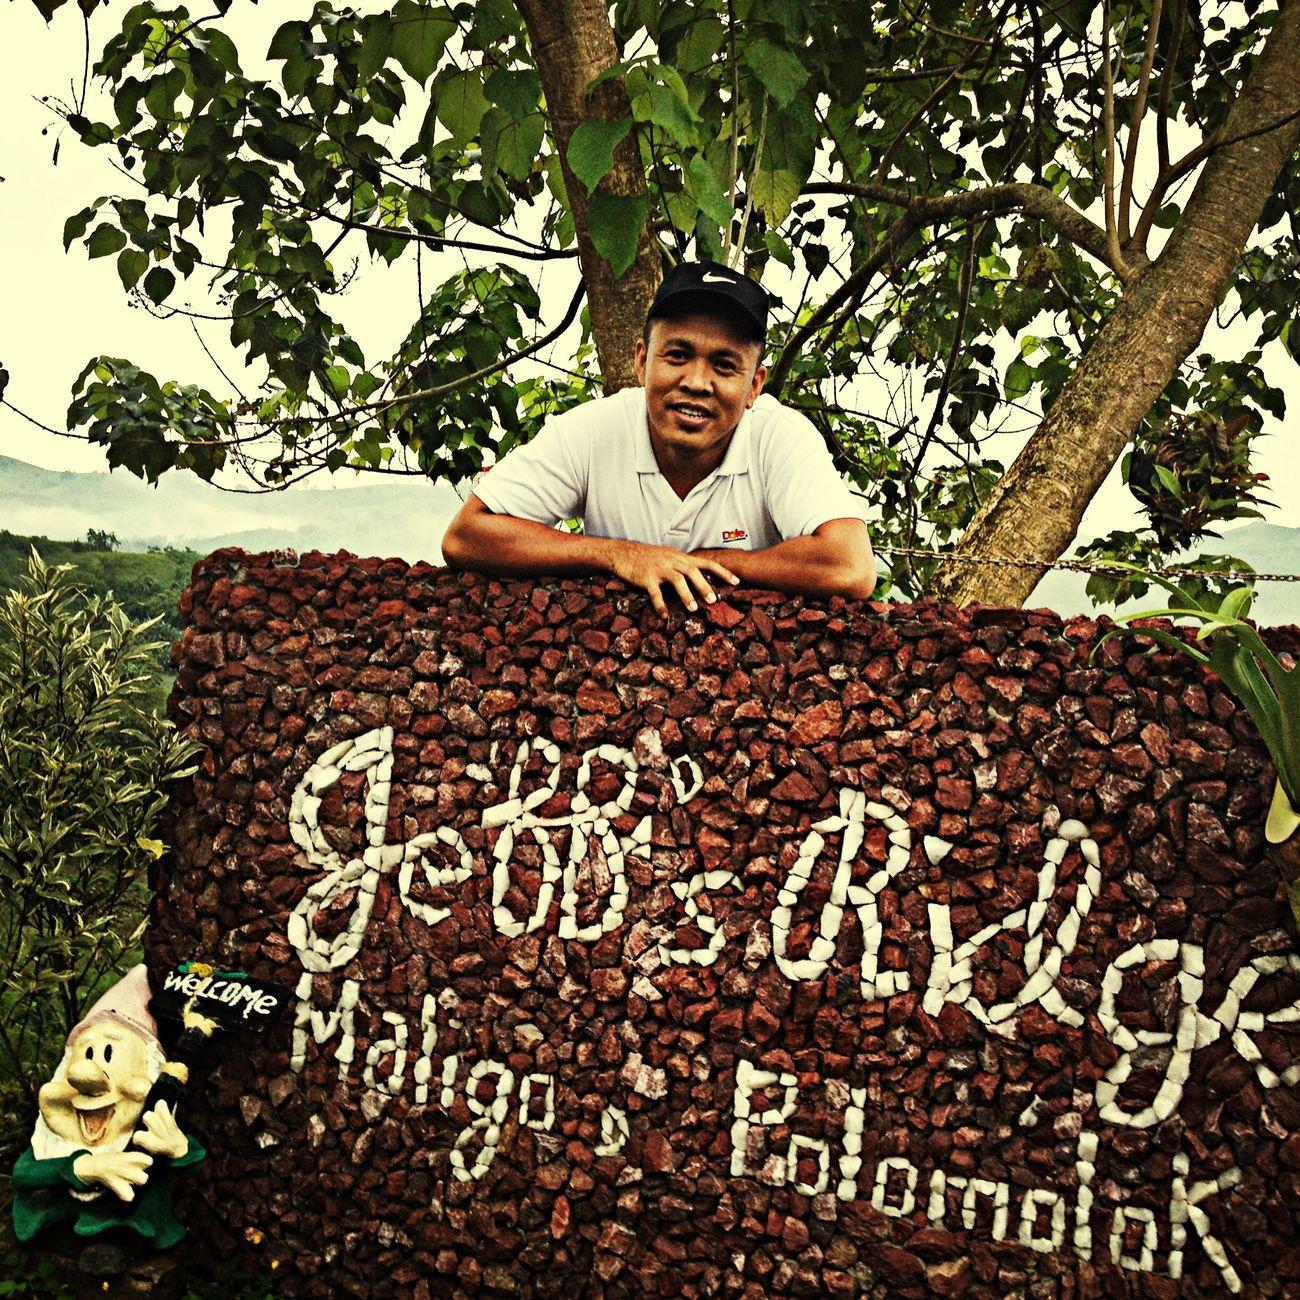 Jeff Ridge